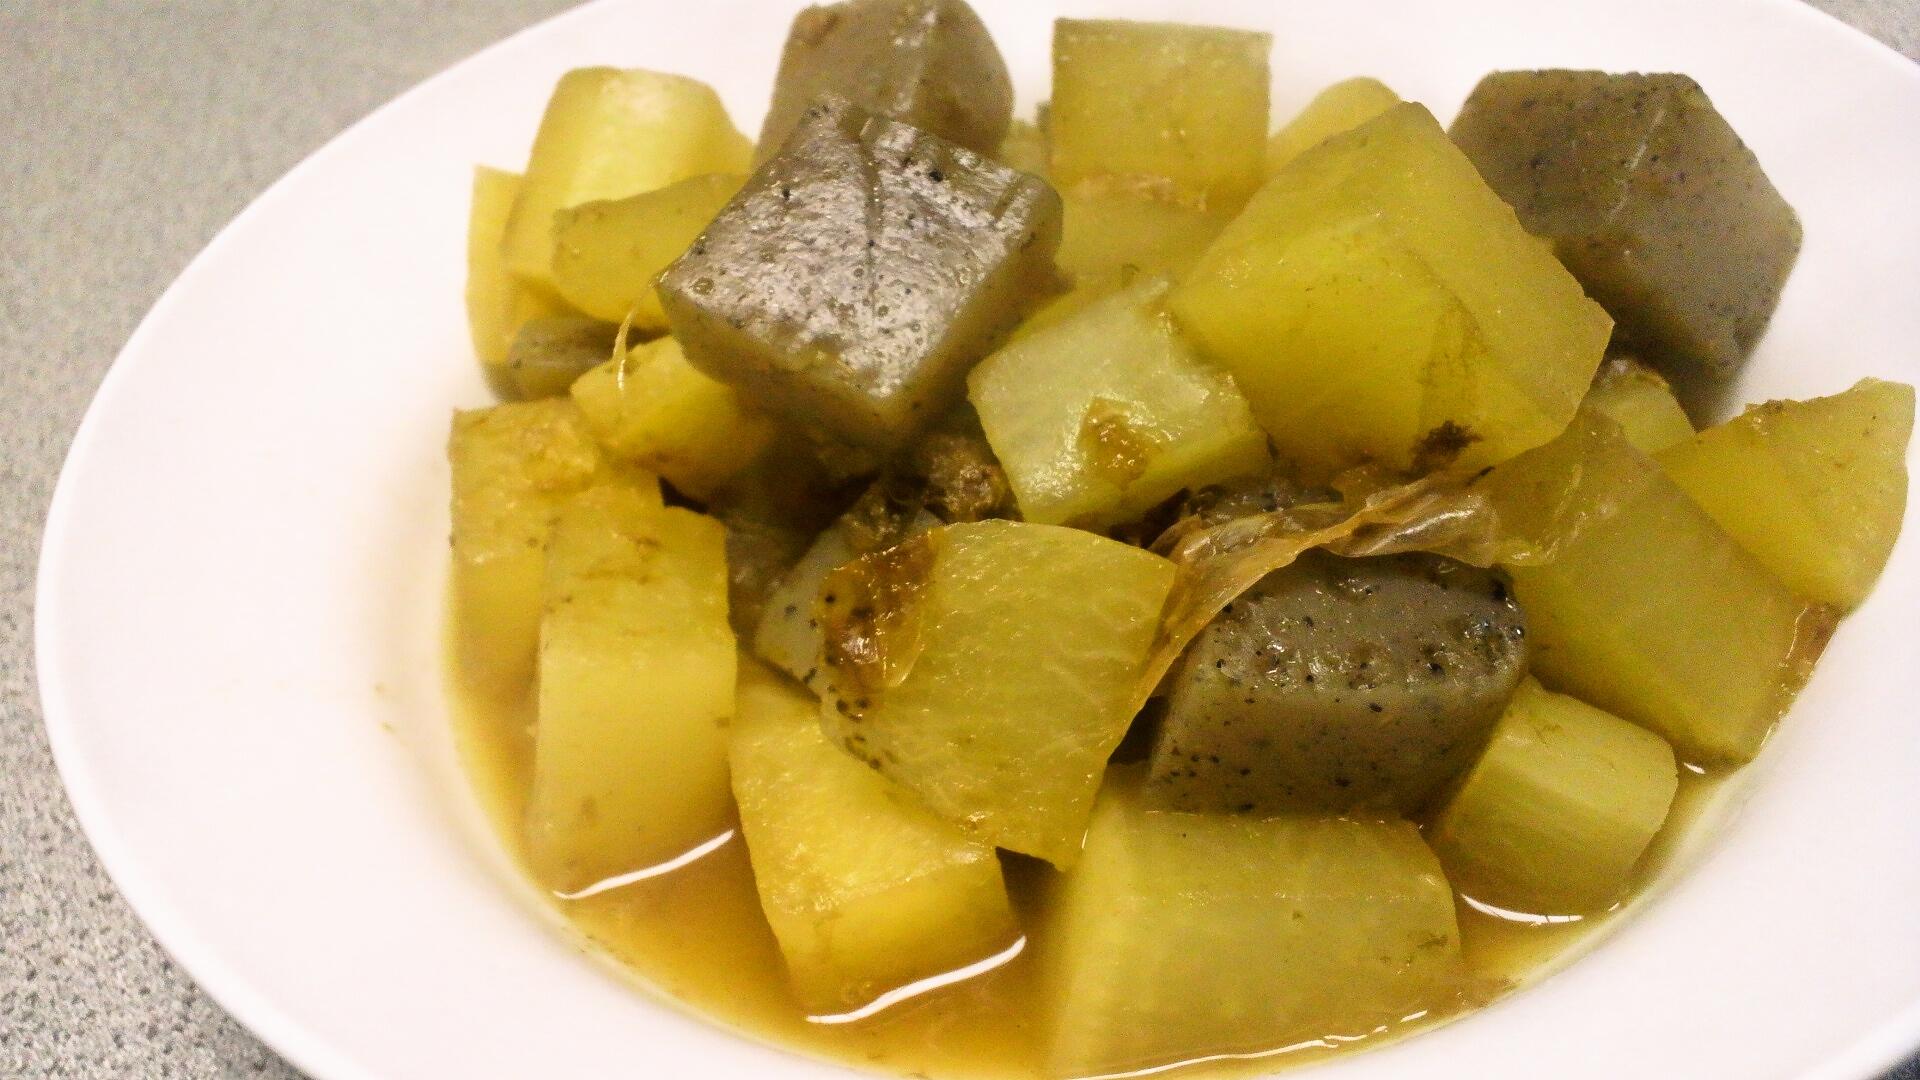 foodpic4775805.jpg